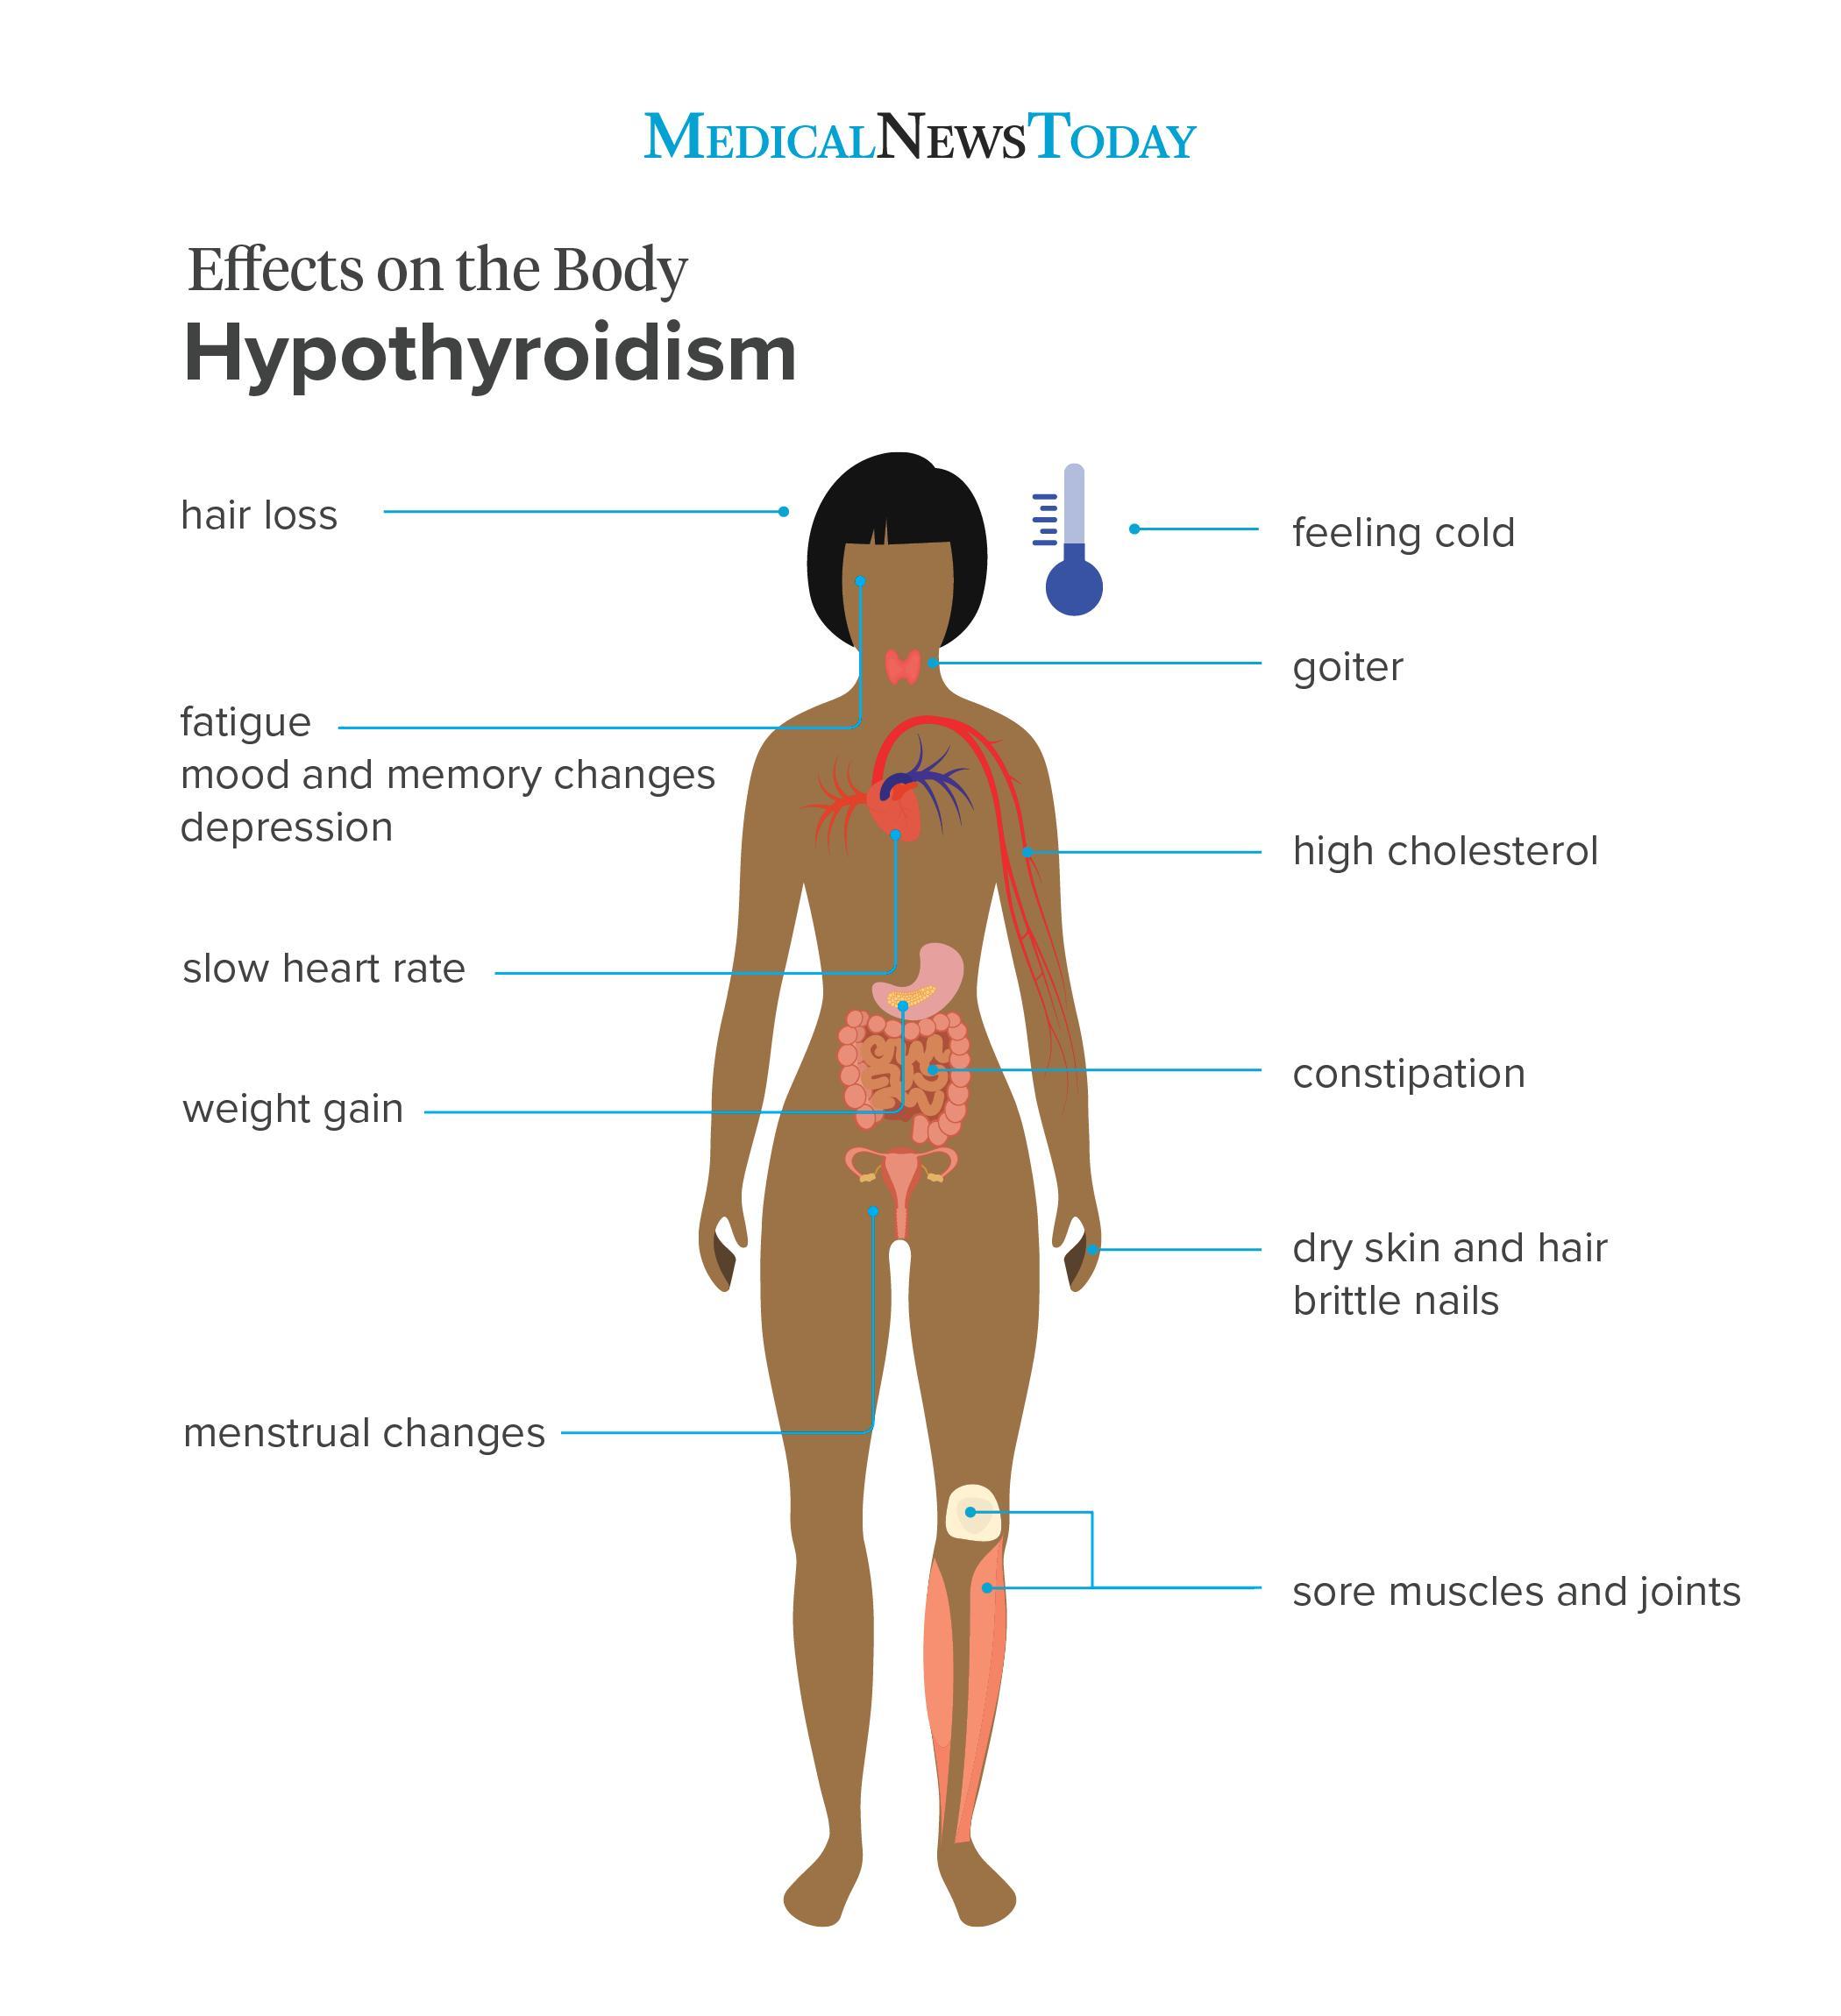 hypothyroidism symptoms 12 signs